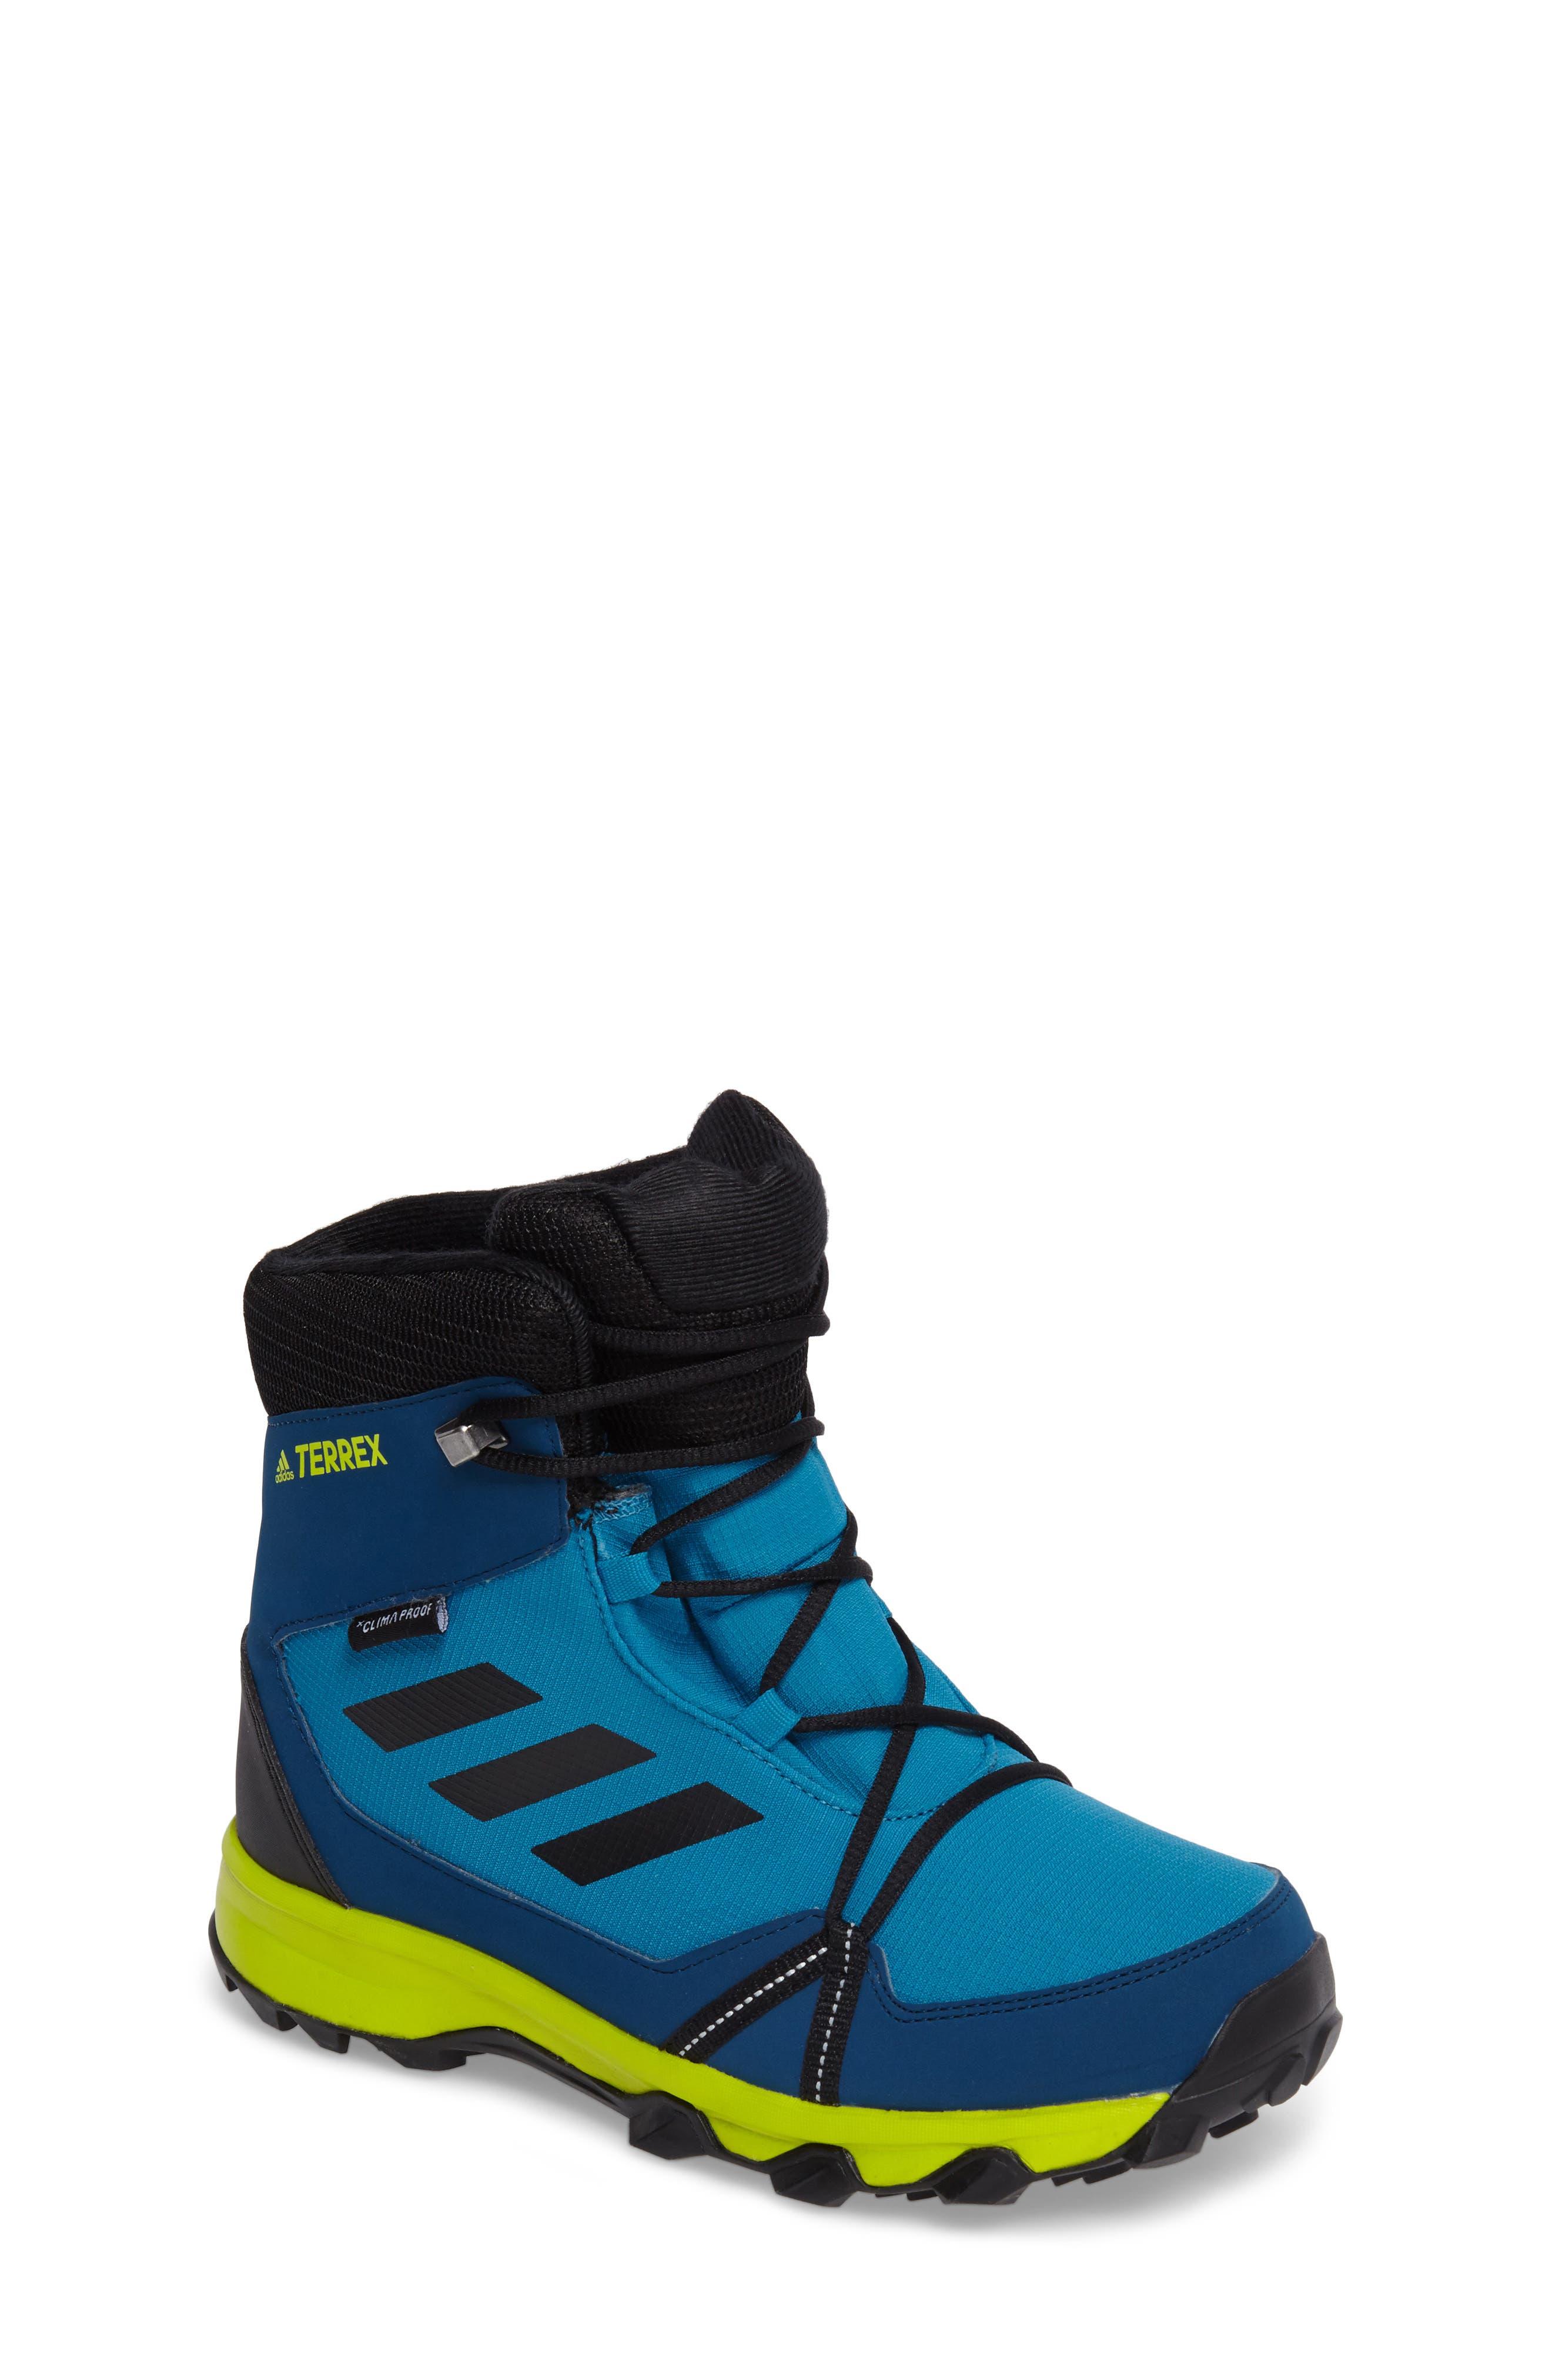 ADIDAS Terrex Snow Sneaker Boot